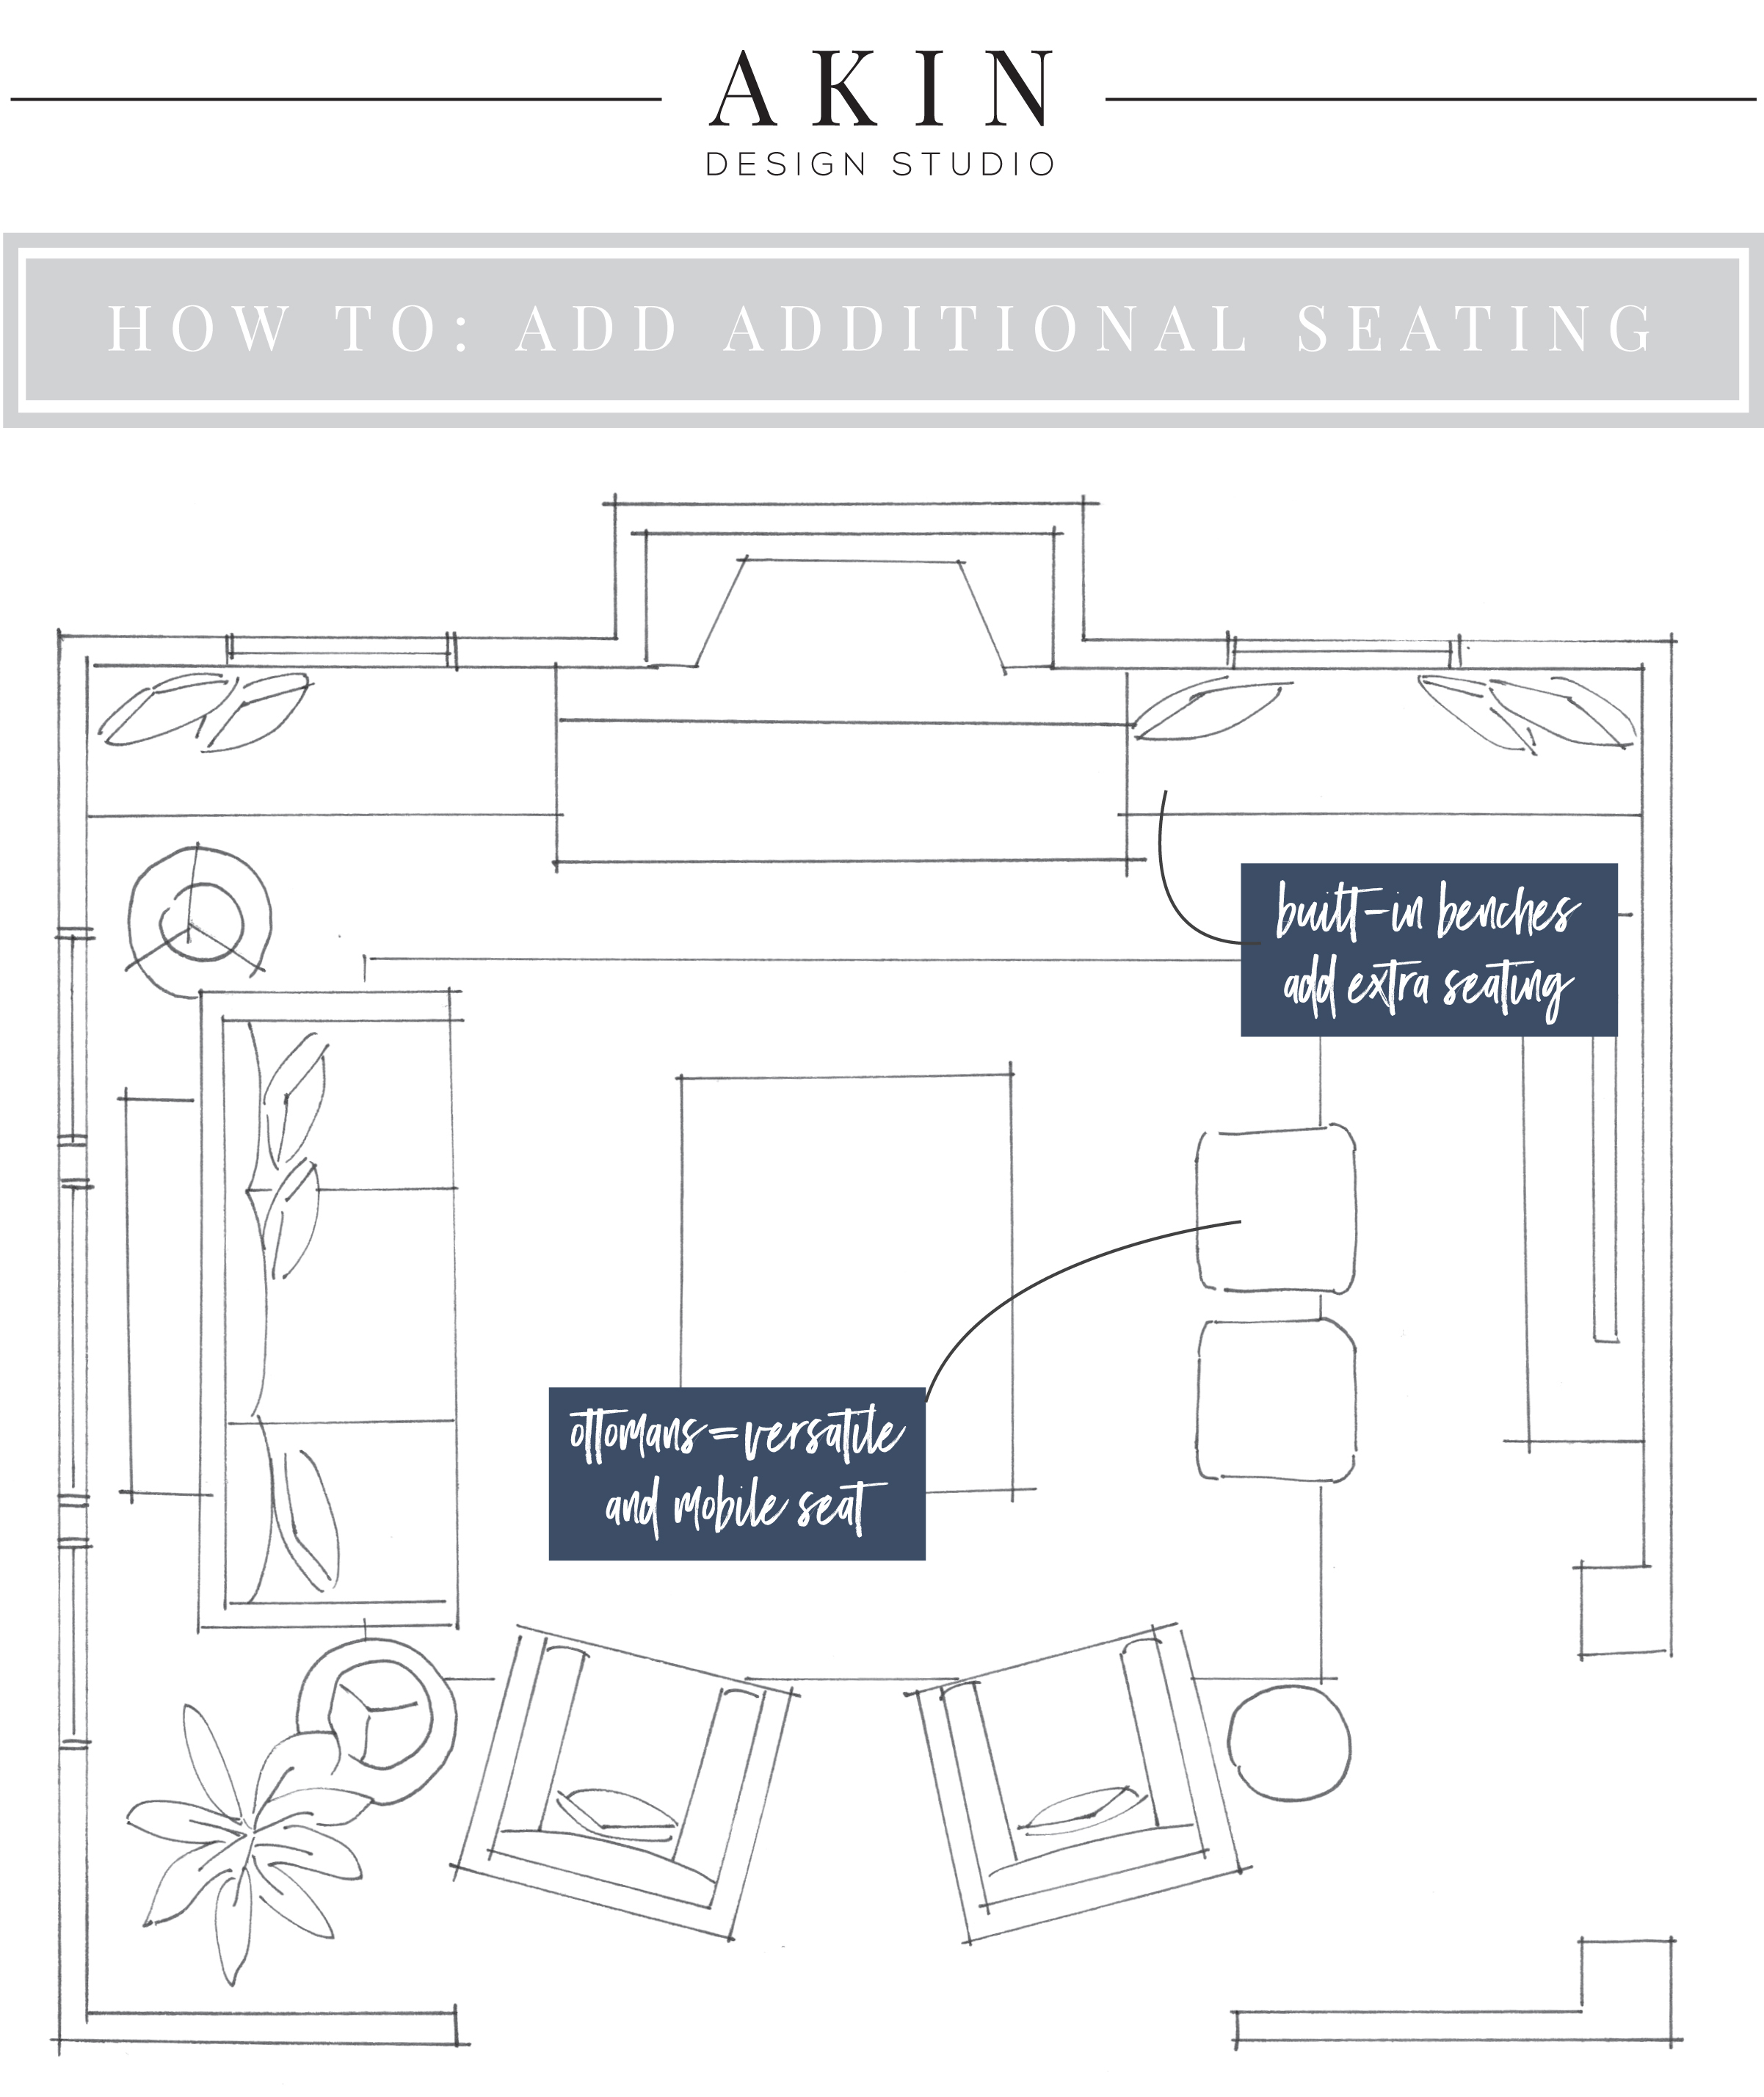 Akin Design Studio Blog | Built-In Seating